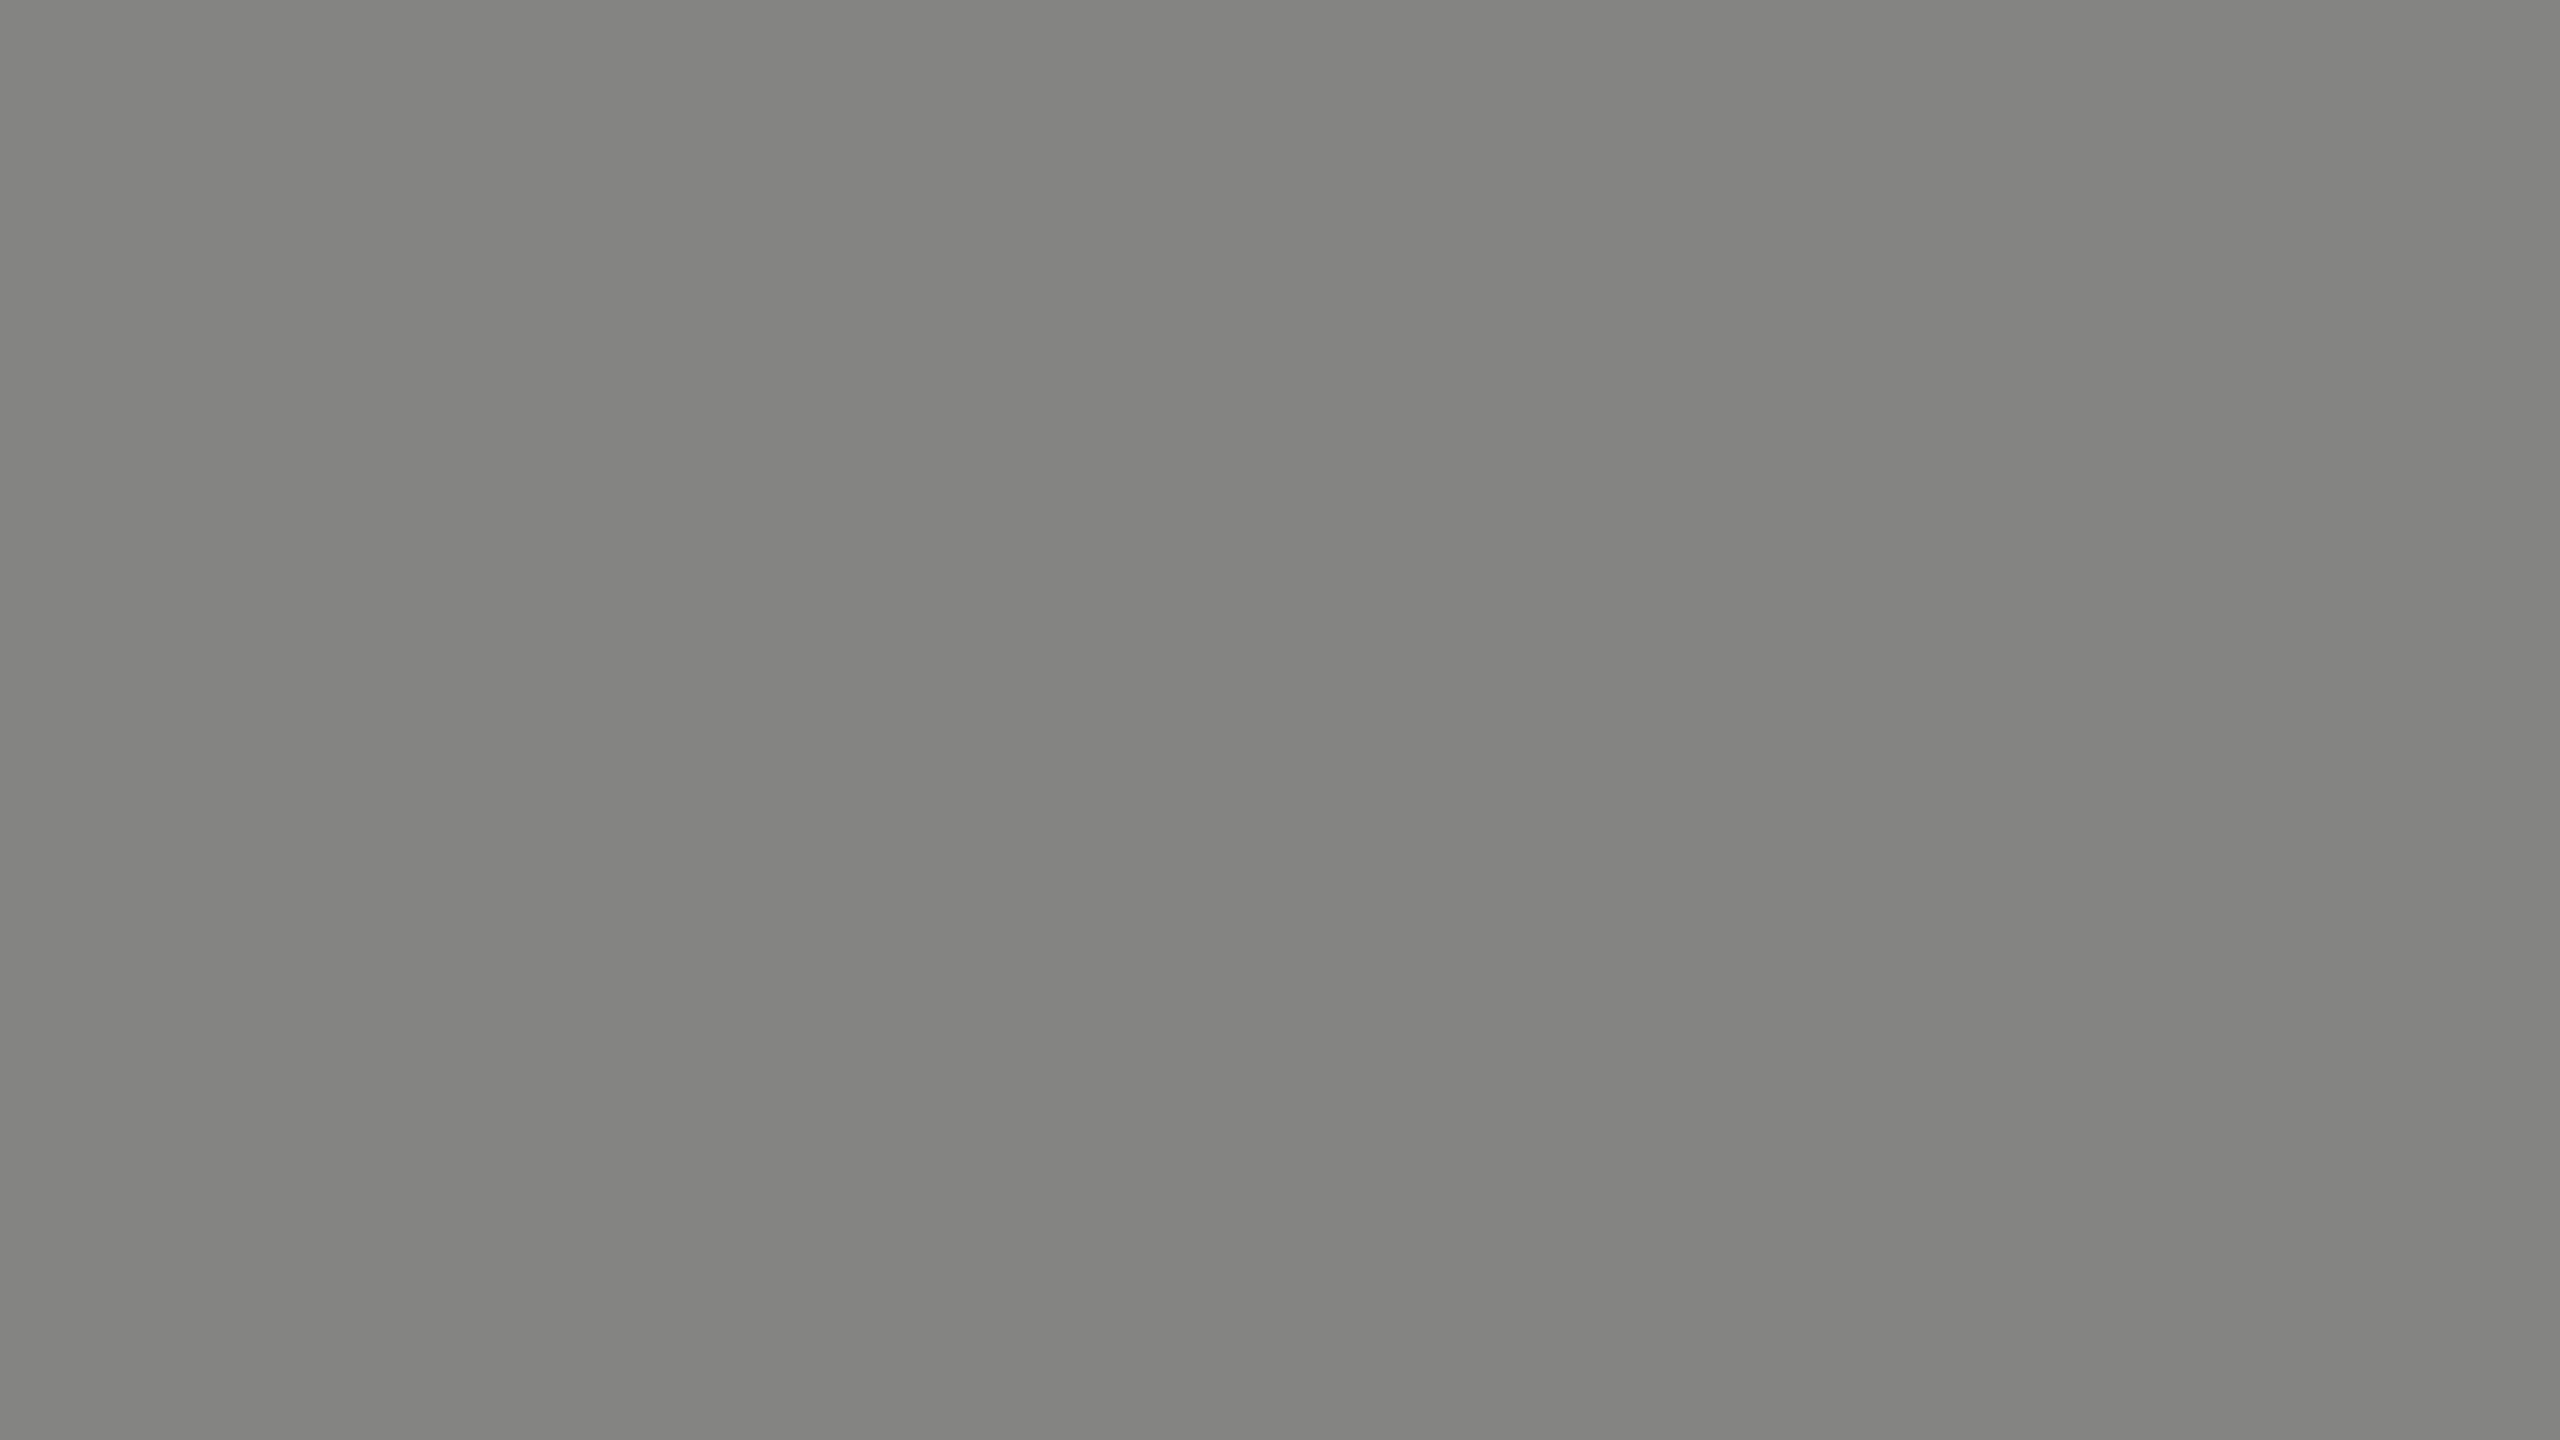 2560x1440 Battleship Grey Solid Color Background